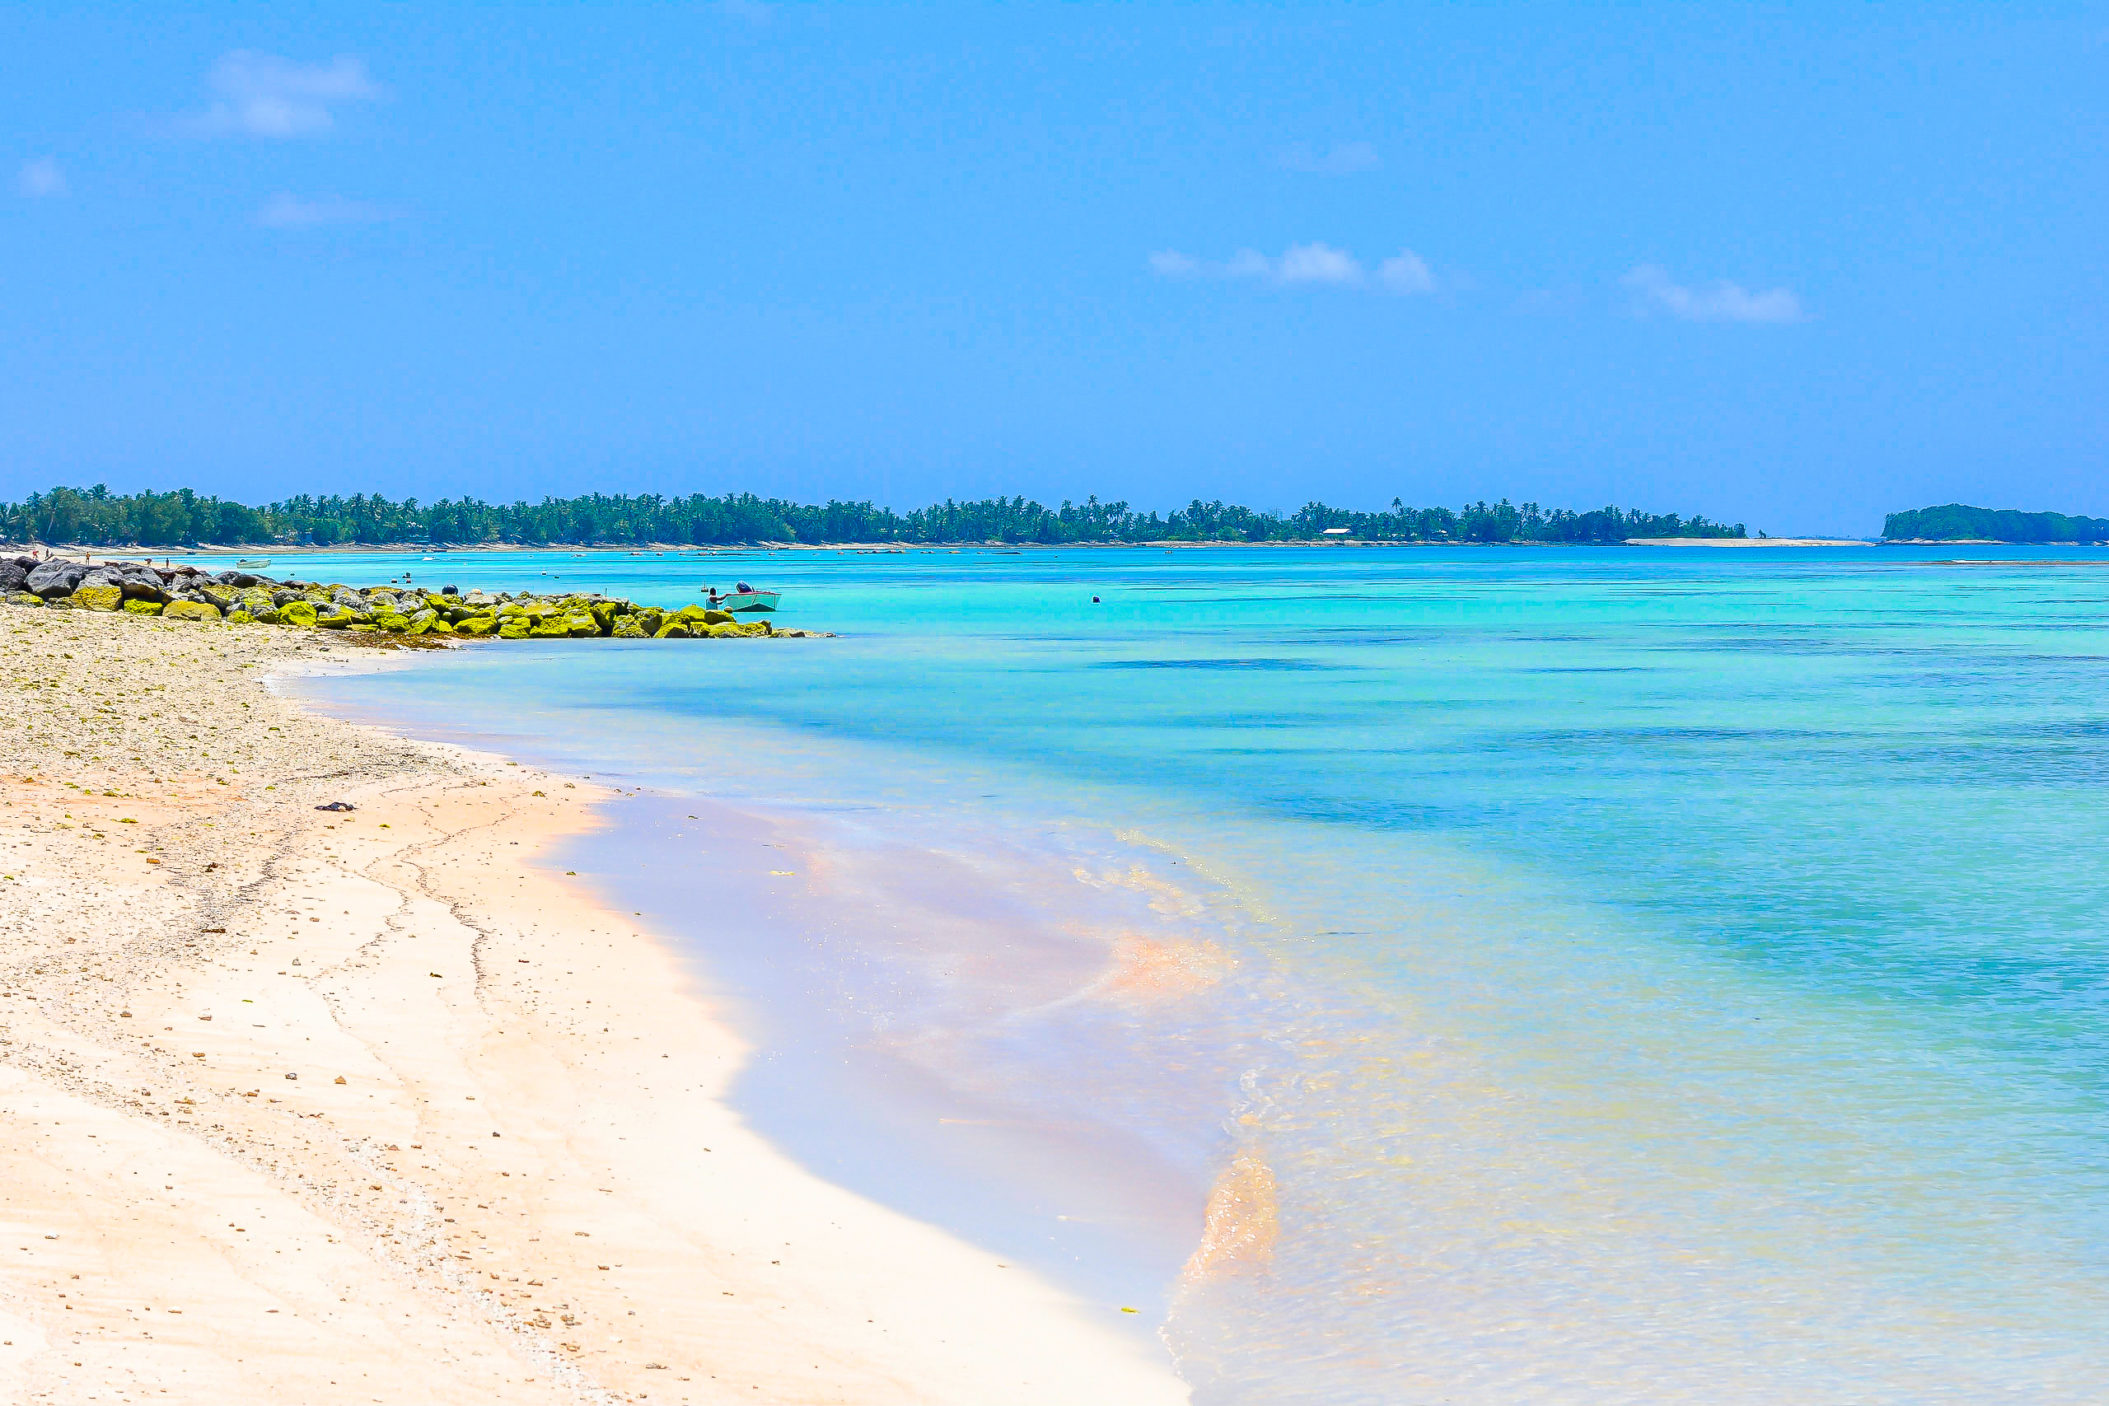 Tuvalu [Shutterstock]